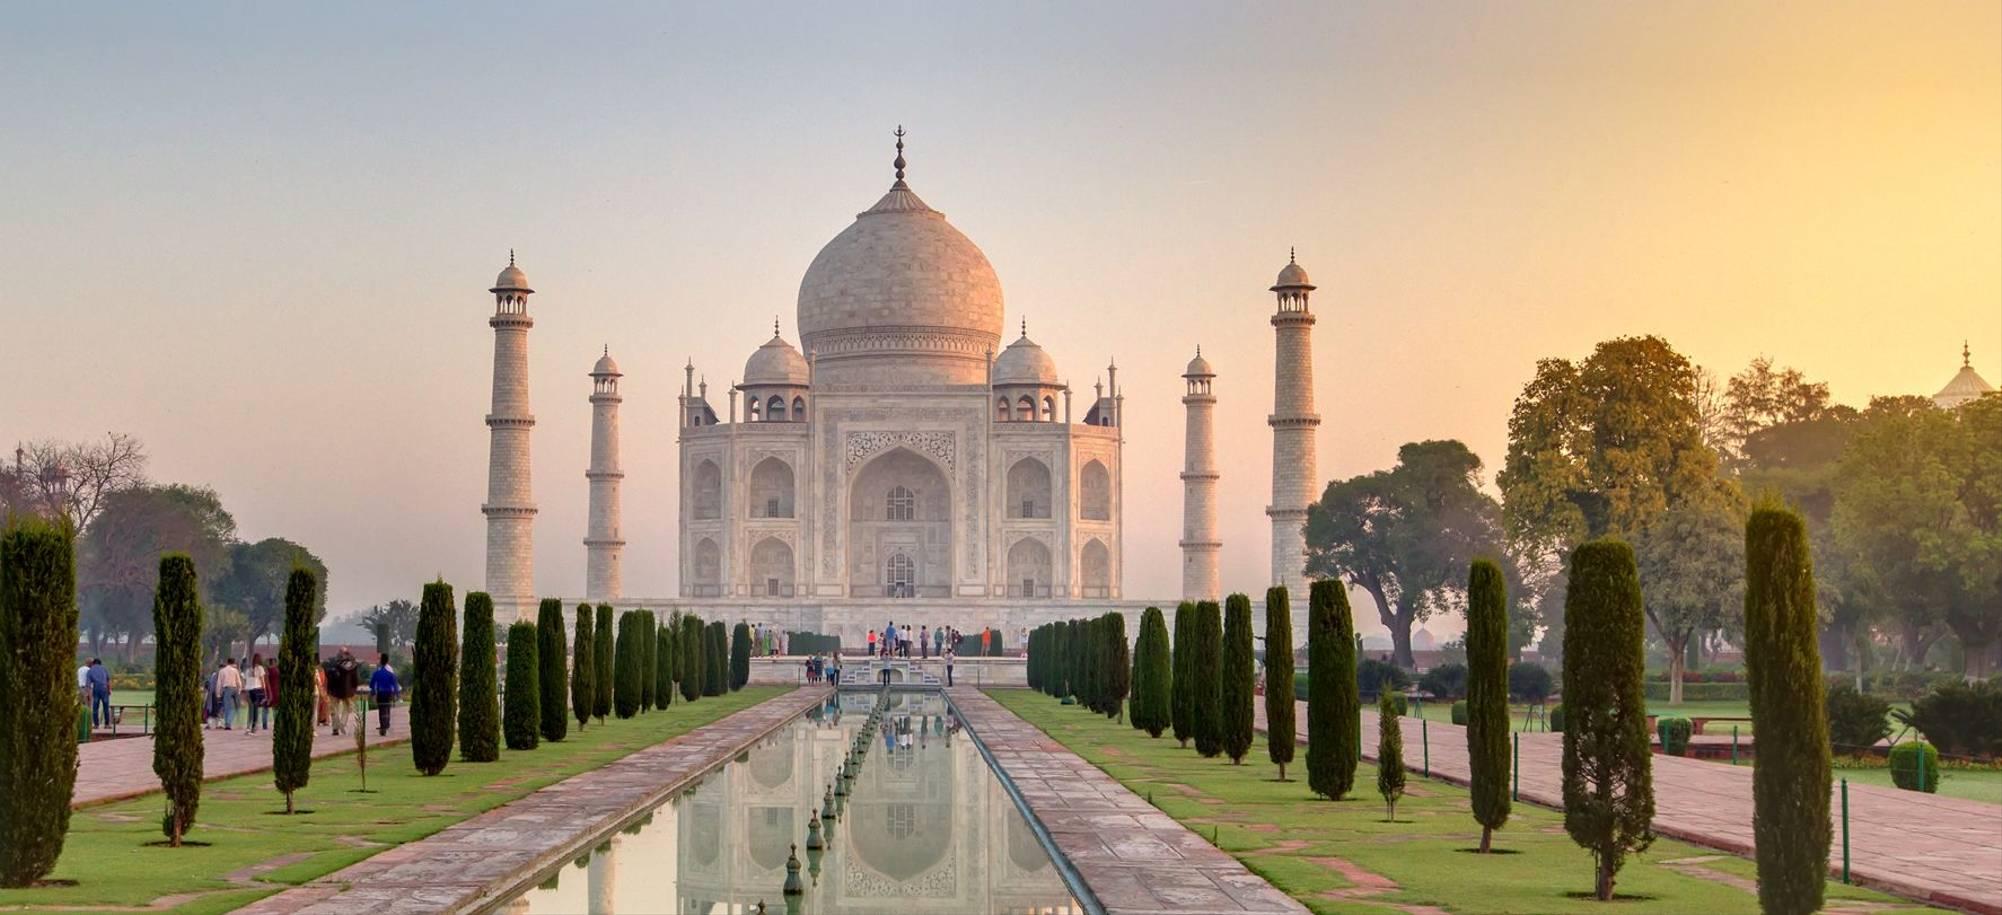 22 Day - Agra, Taj Mahal -Itinerary Desktop.jpg